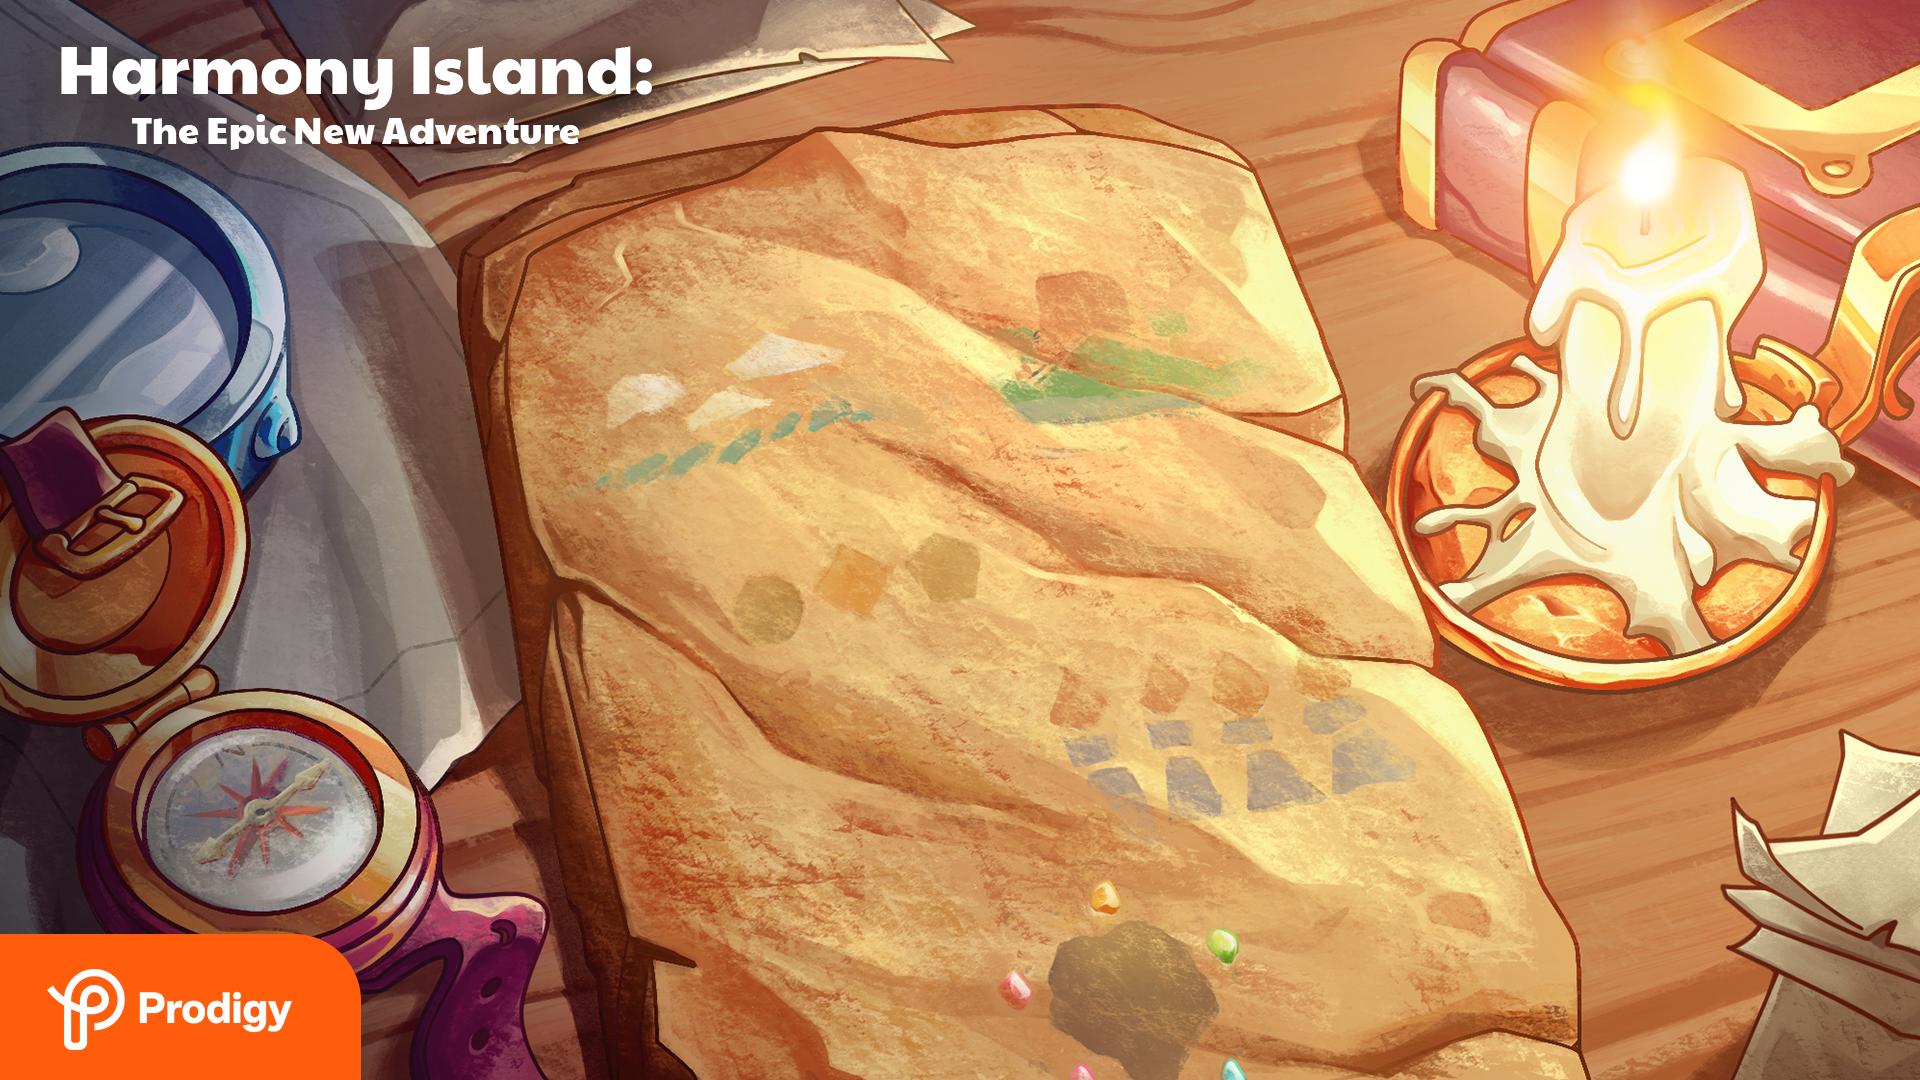 Harmony Island Zoom background: the tablet